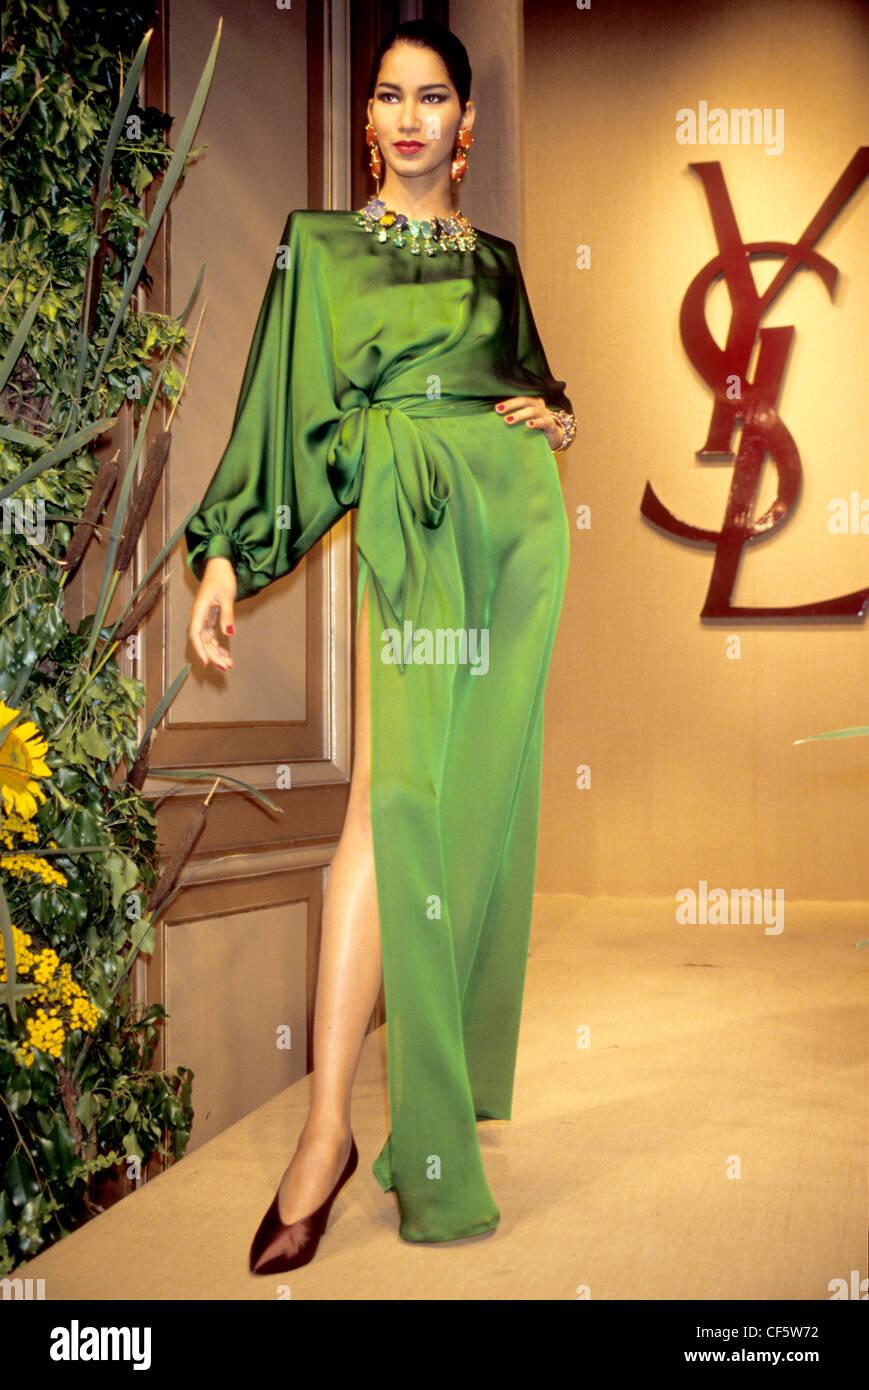 4c54981703cf Yves Saint Laurent Automne Hiver Femme porter robe verte en satin avec  split cuisse